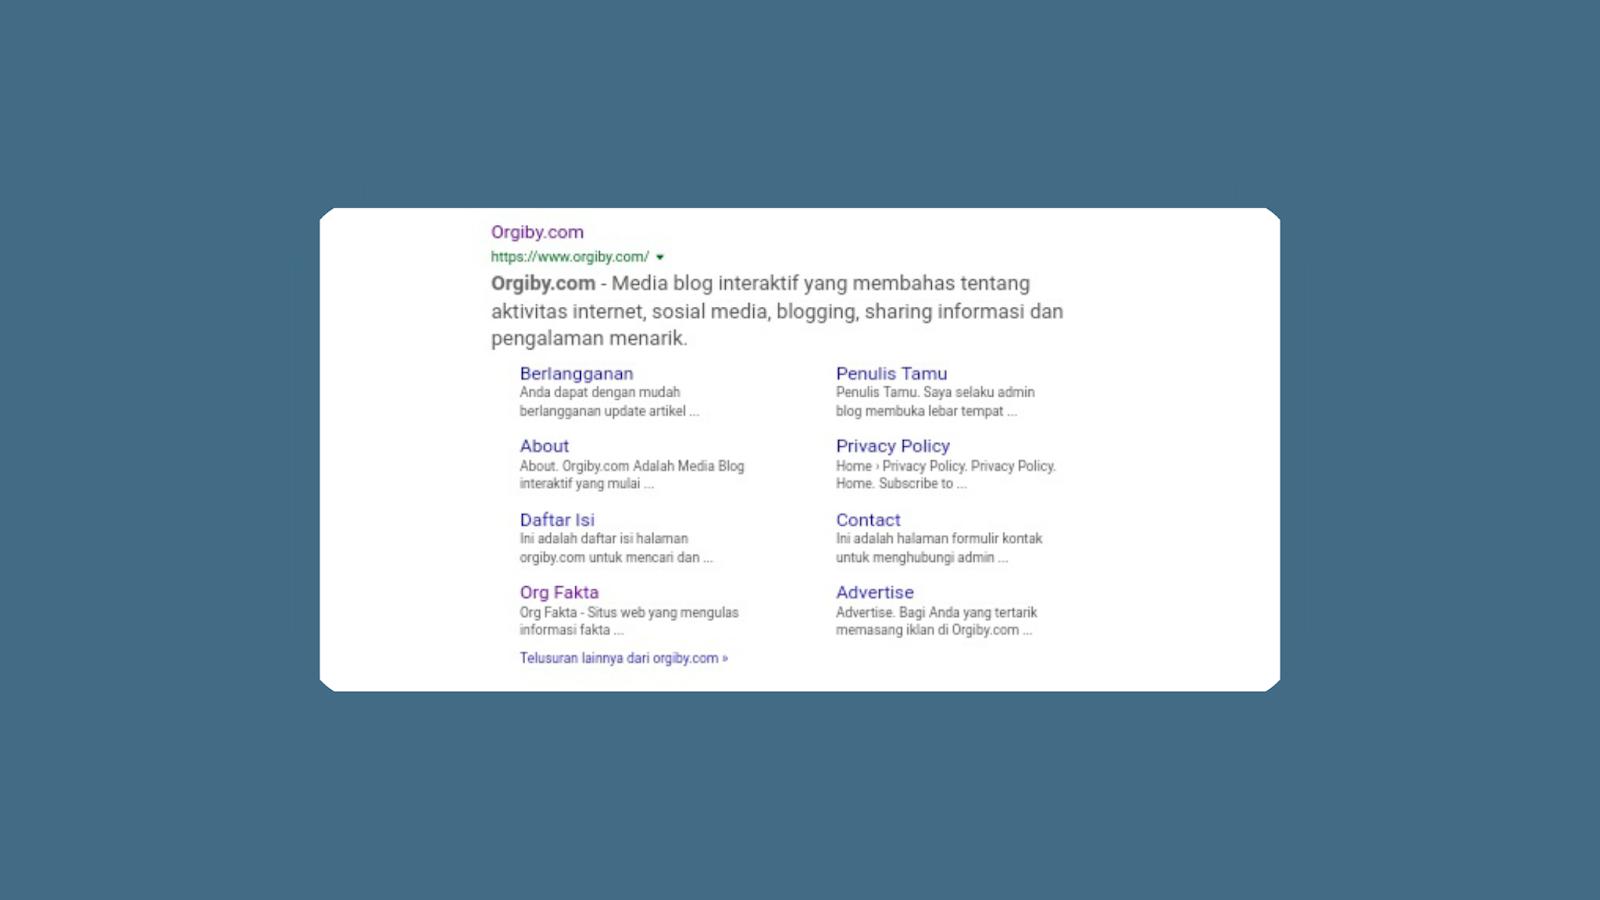 Cara Memasukan Blog Lain Ke Dalam Sitelink Blog Utama